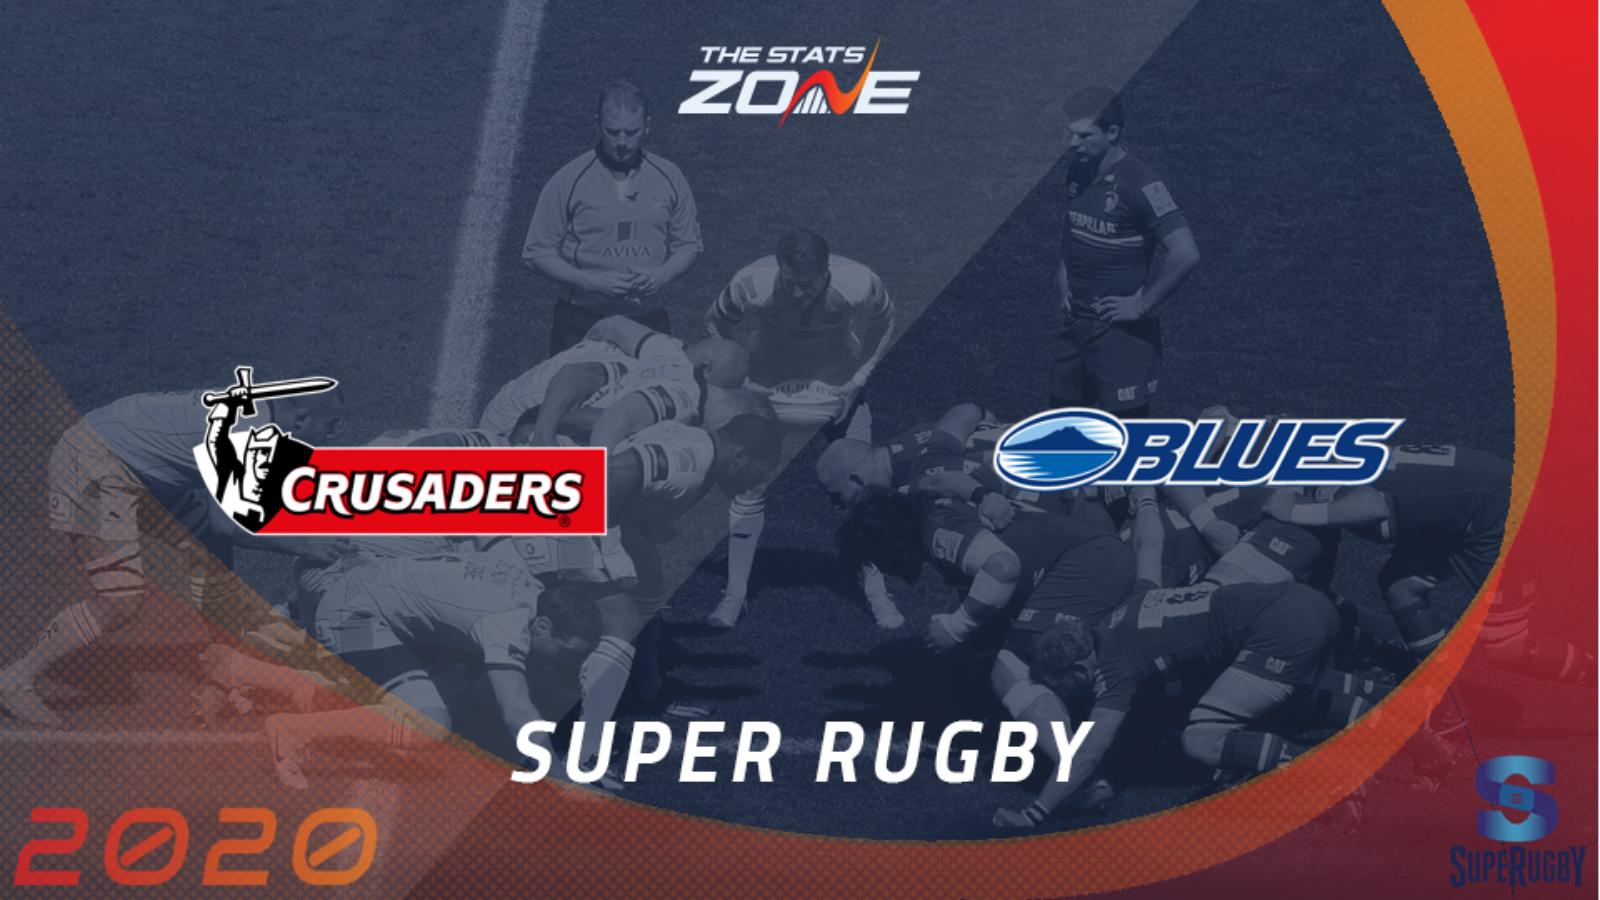 Crusaders vs Blues - Report - Super Rugby Aotearoa 2020 - 11 Jul, 2020